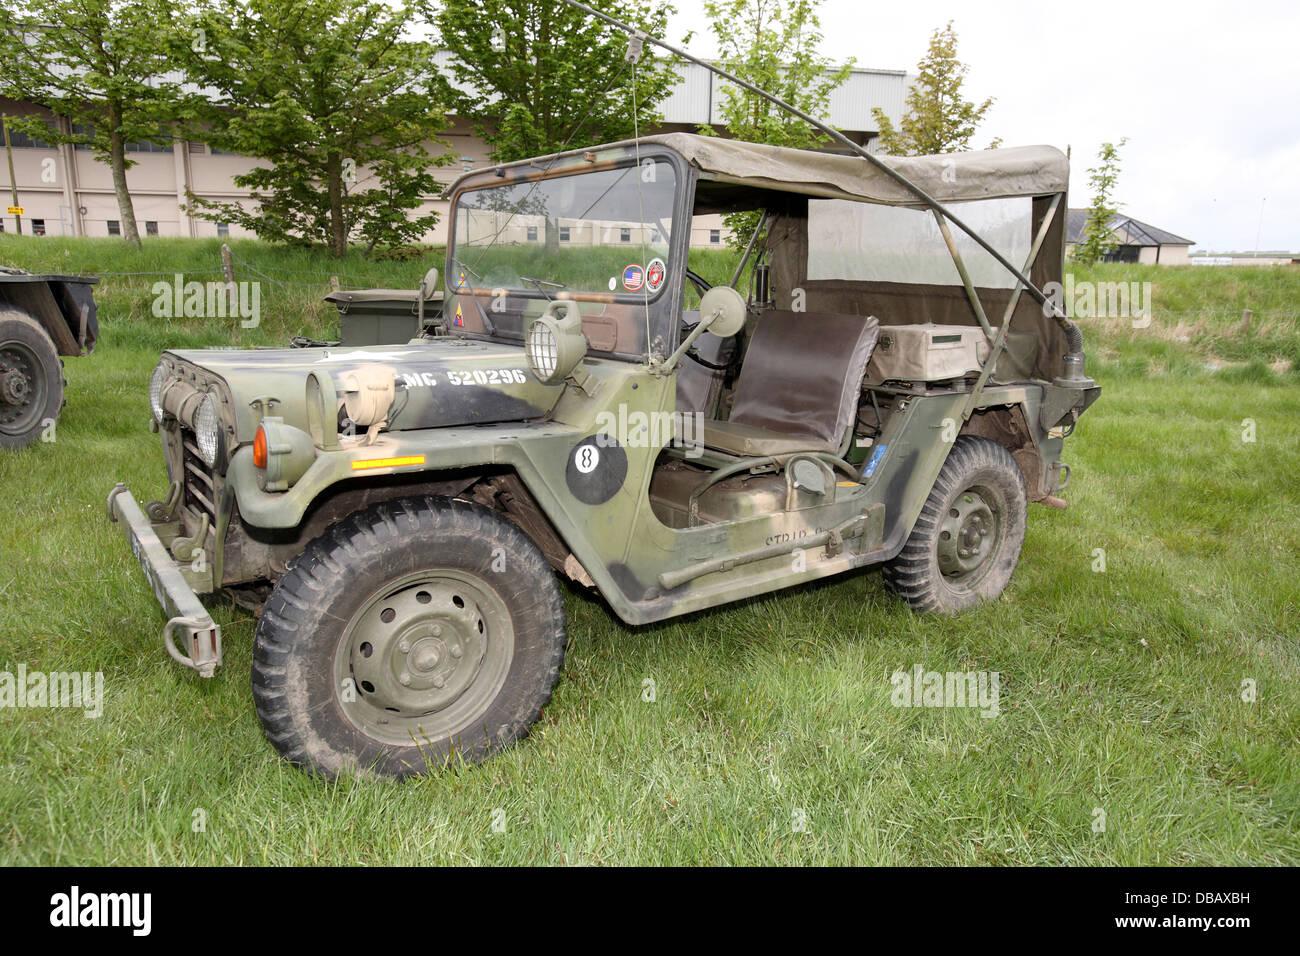 amerikanischen jeep stockfoto bild 58632549 alamy. Black Bedroom Furniture Sets. Home Design Ideas